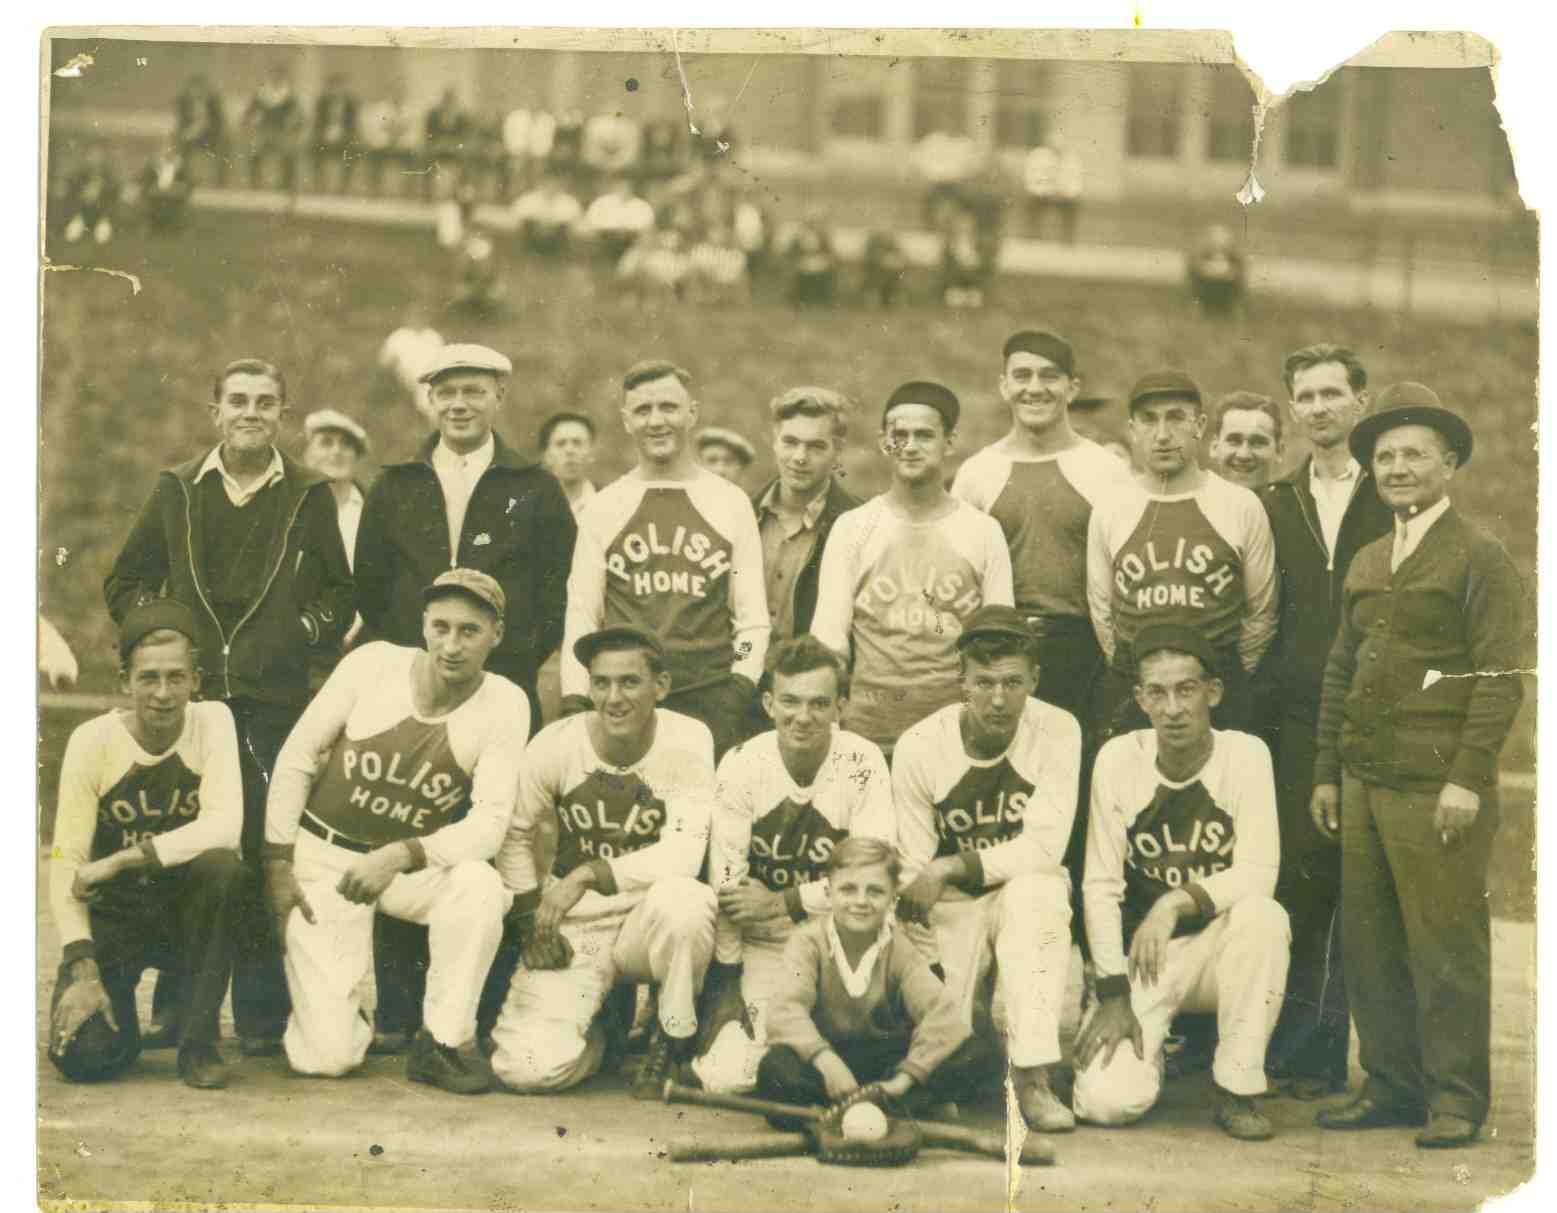 1935 Softball Champs at Frazer